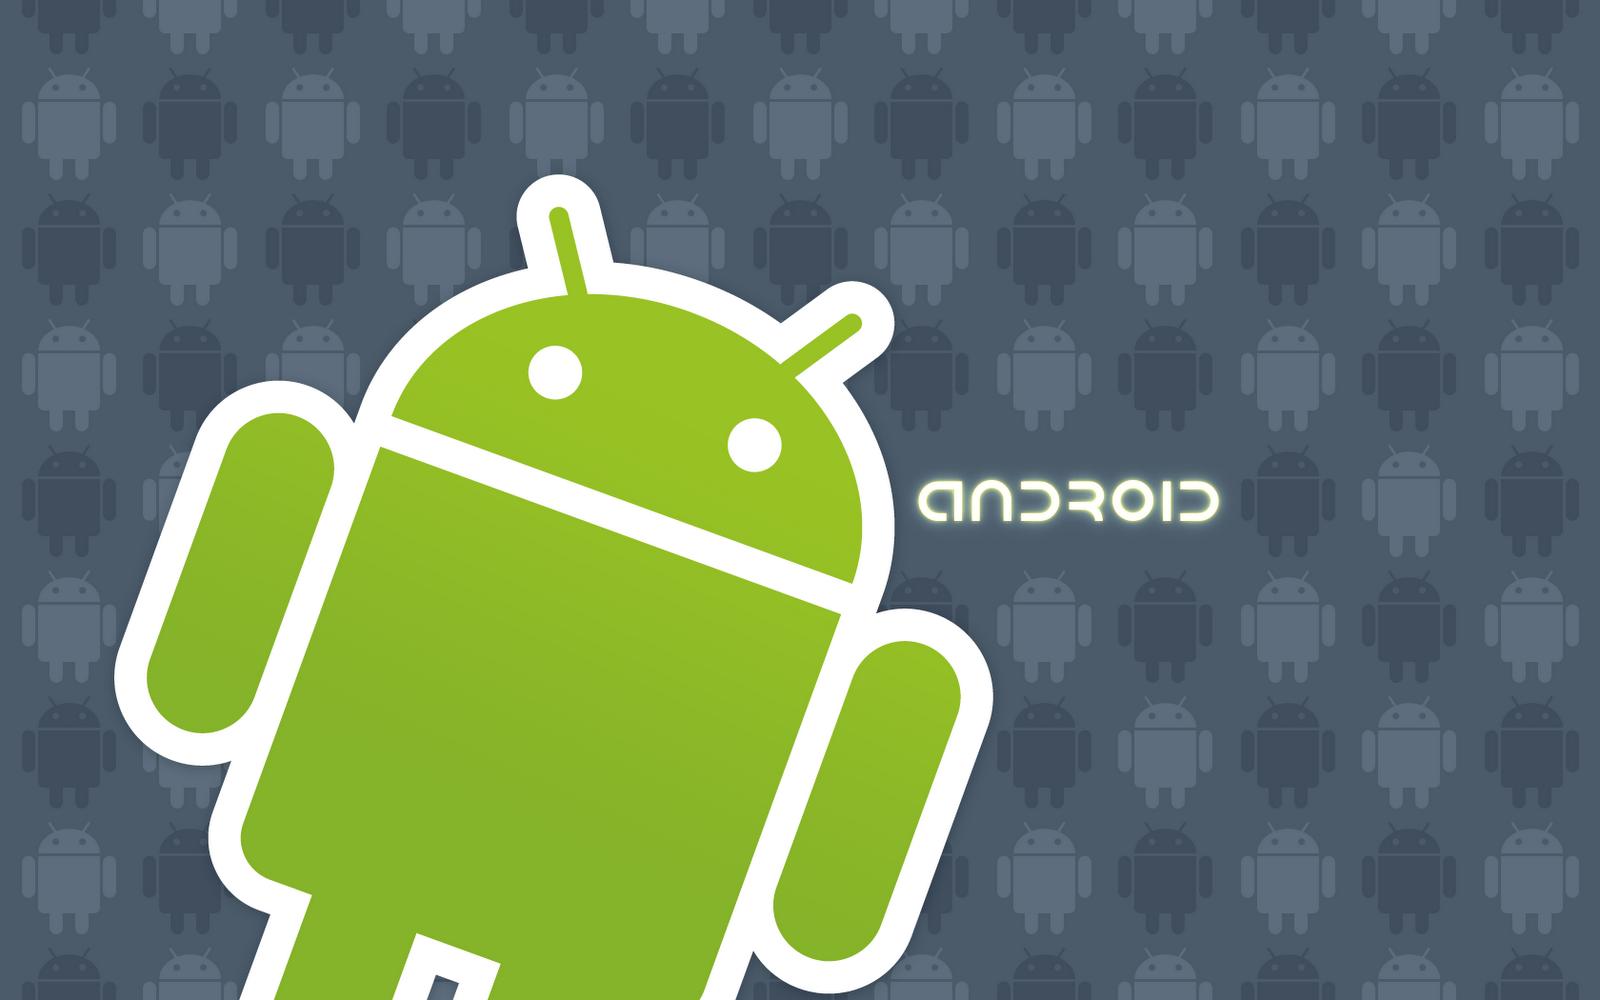 http://3.bp.blogspot.com/-aL0UJvyof6A/TVd5Zlaj-0I/AAAAAAAAAKA/07vWAW8i9MU/s1600/android-wallpaper1_1680x1050.png